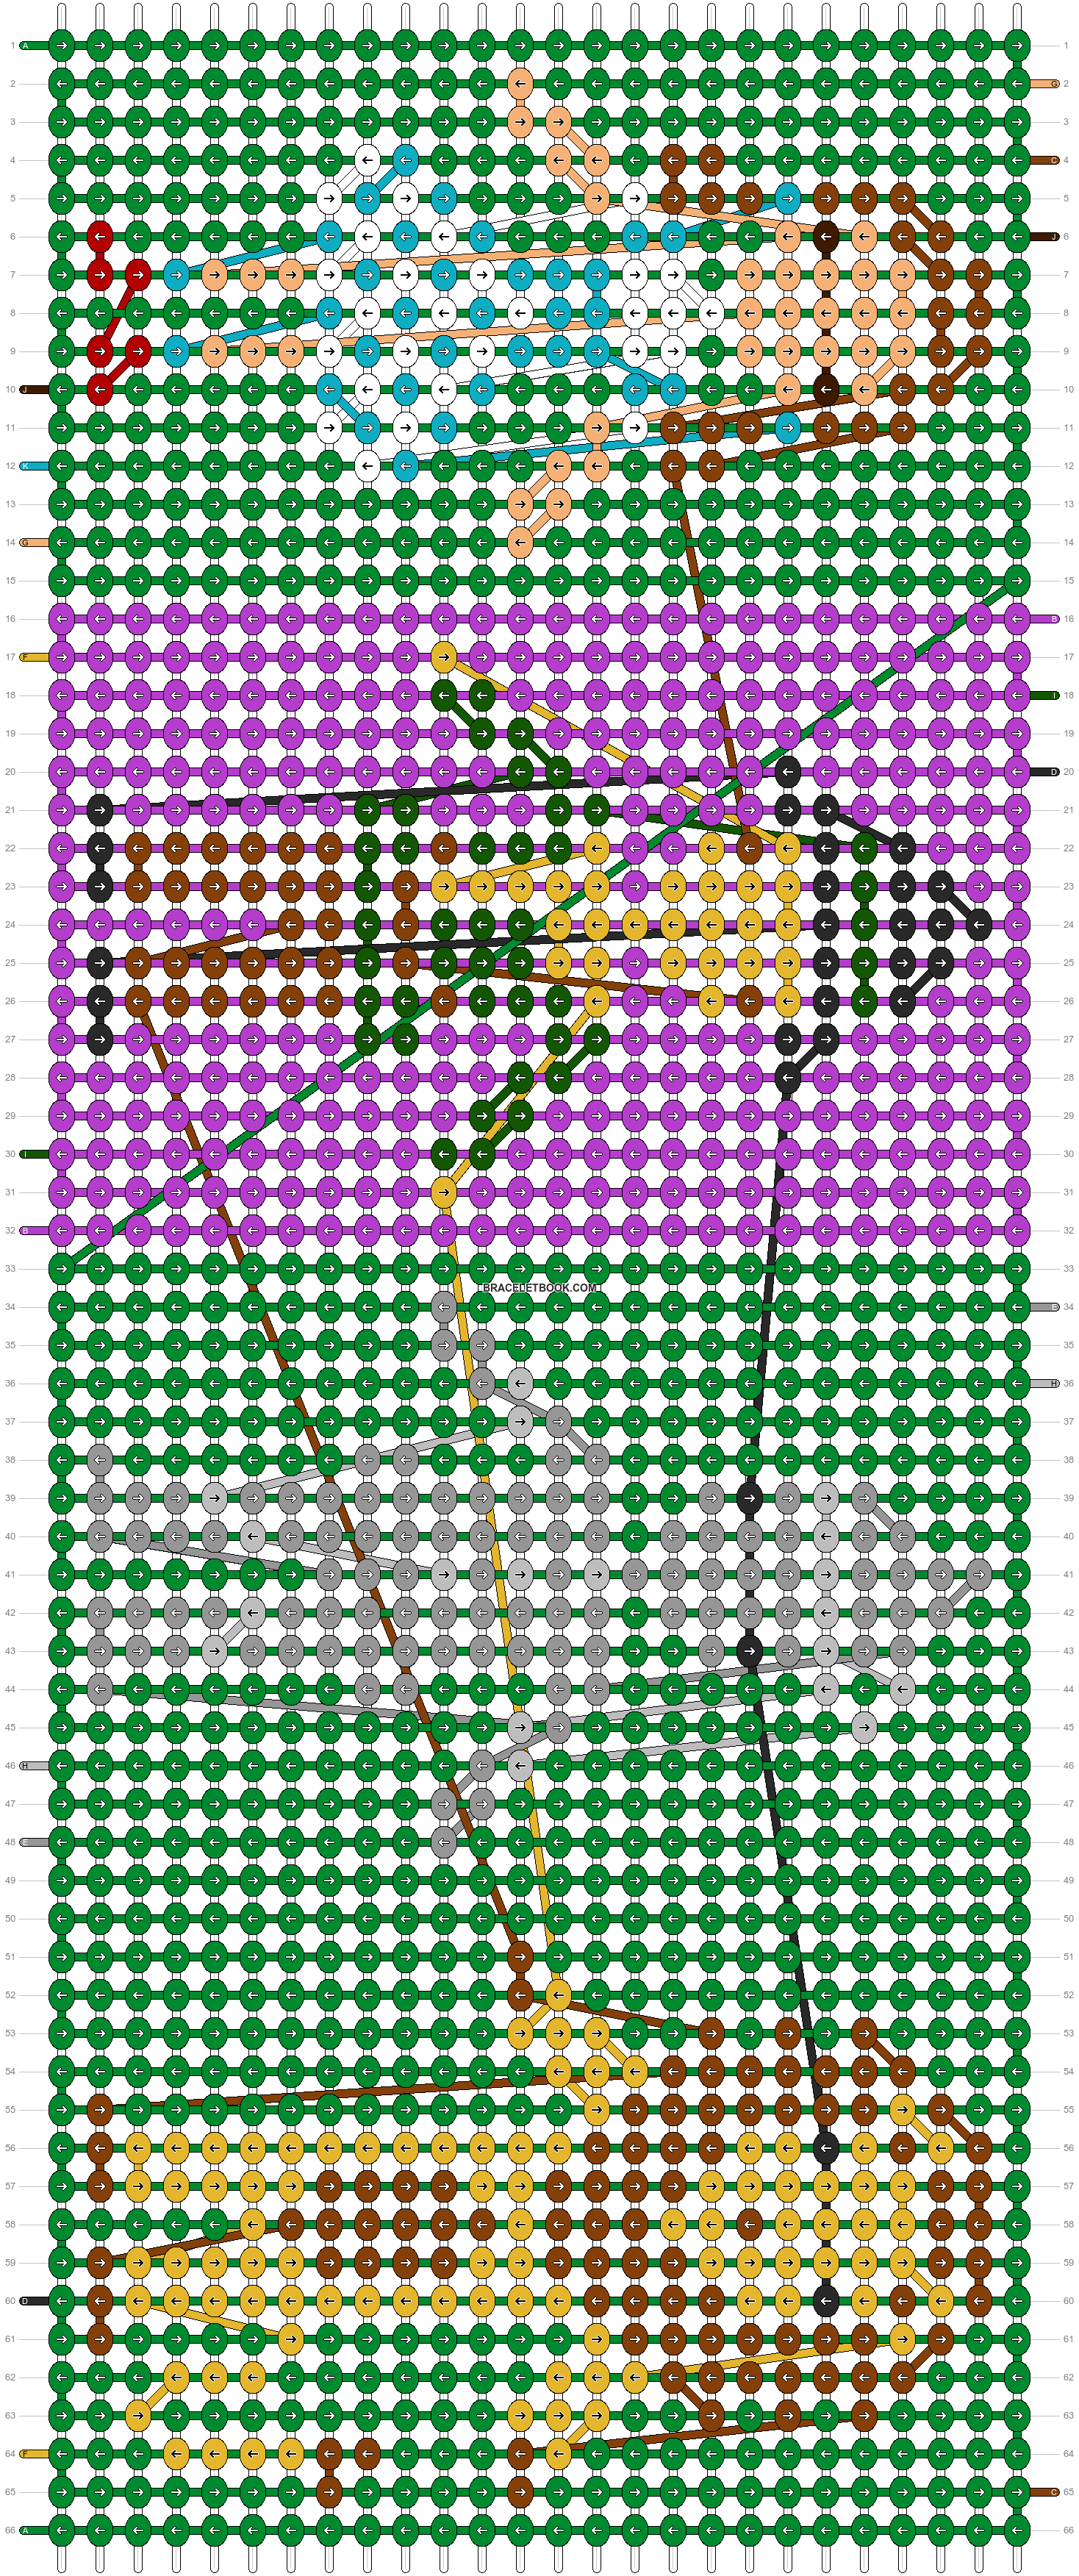 Alpha Pattern #13246 added by SBilbrey